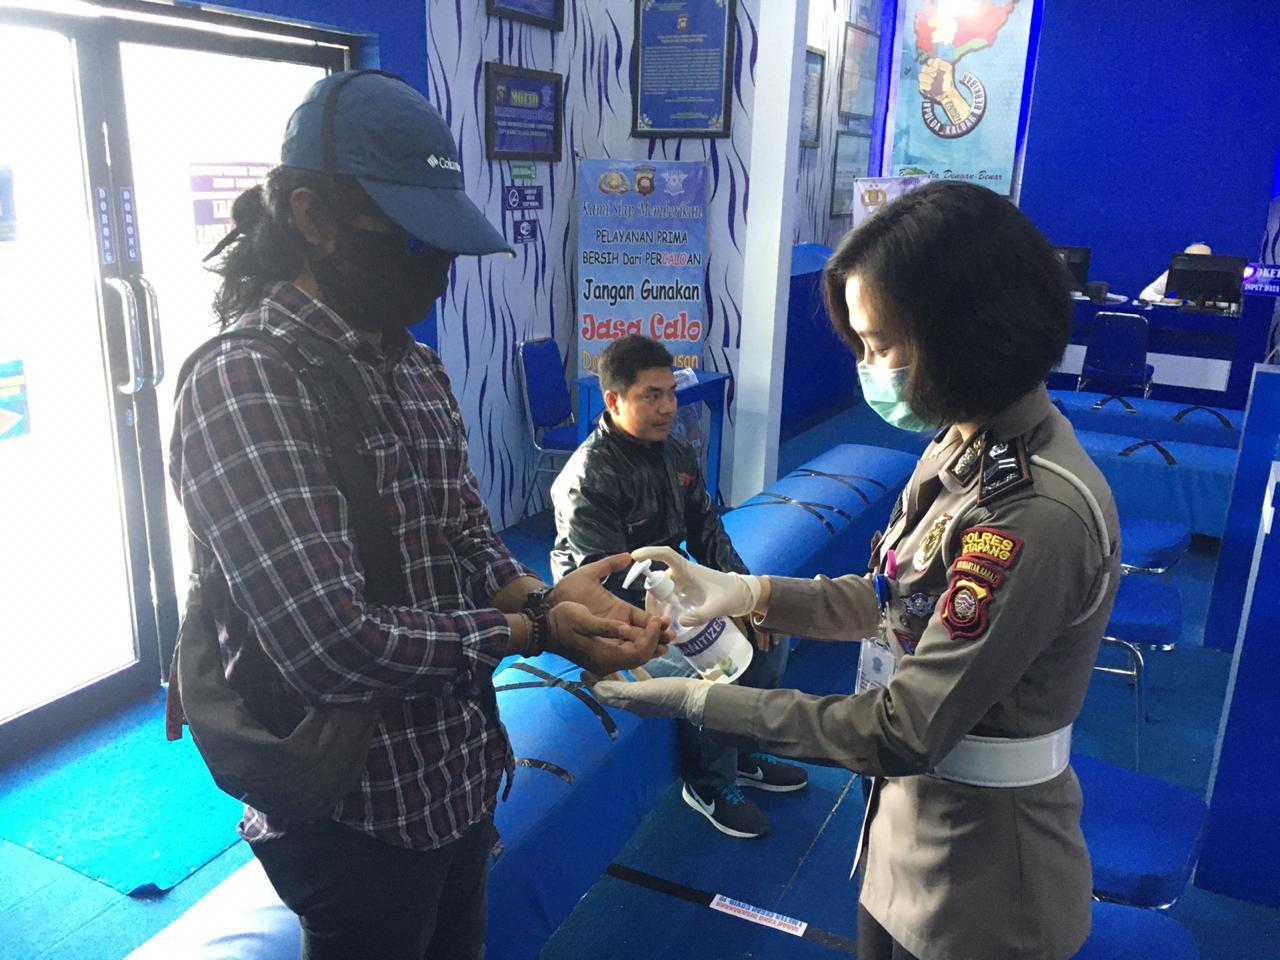 Cegah Virus Corona, Satlantas Bagi-Bagi Masker dan Hand Sanitizer Kepada Pemohon SIM dan Wajib Pajak